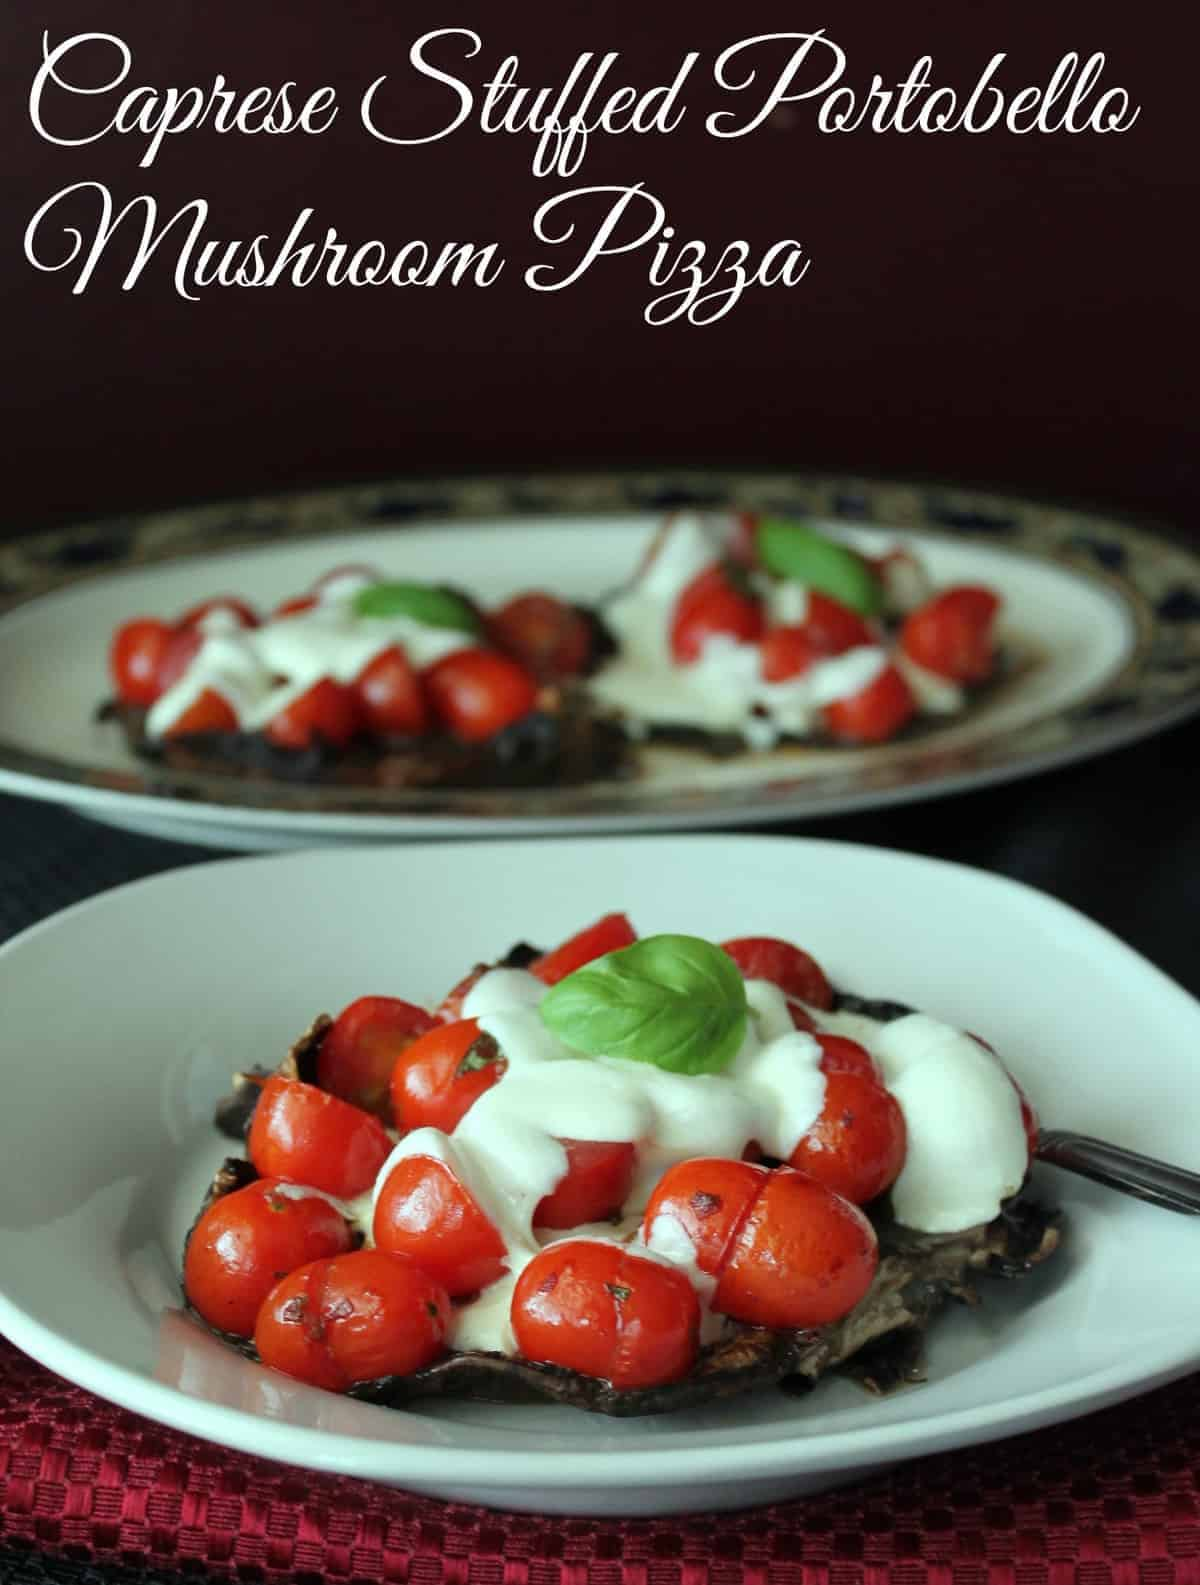 Caprese Stuffed Portobello Mushroom Pizza 275 Calories and  7 Weight Watchers Points +